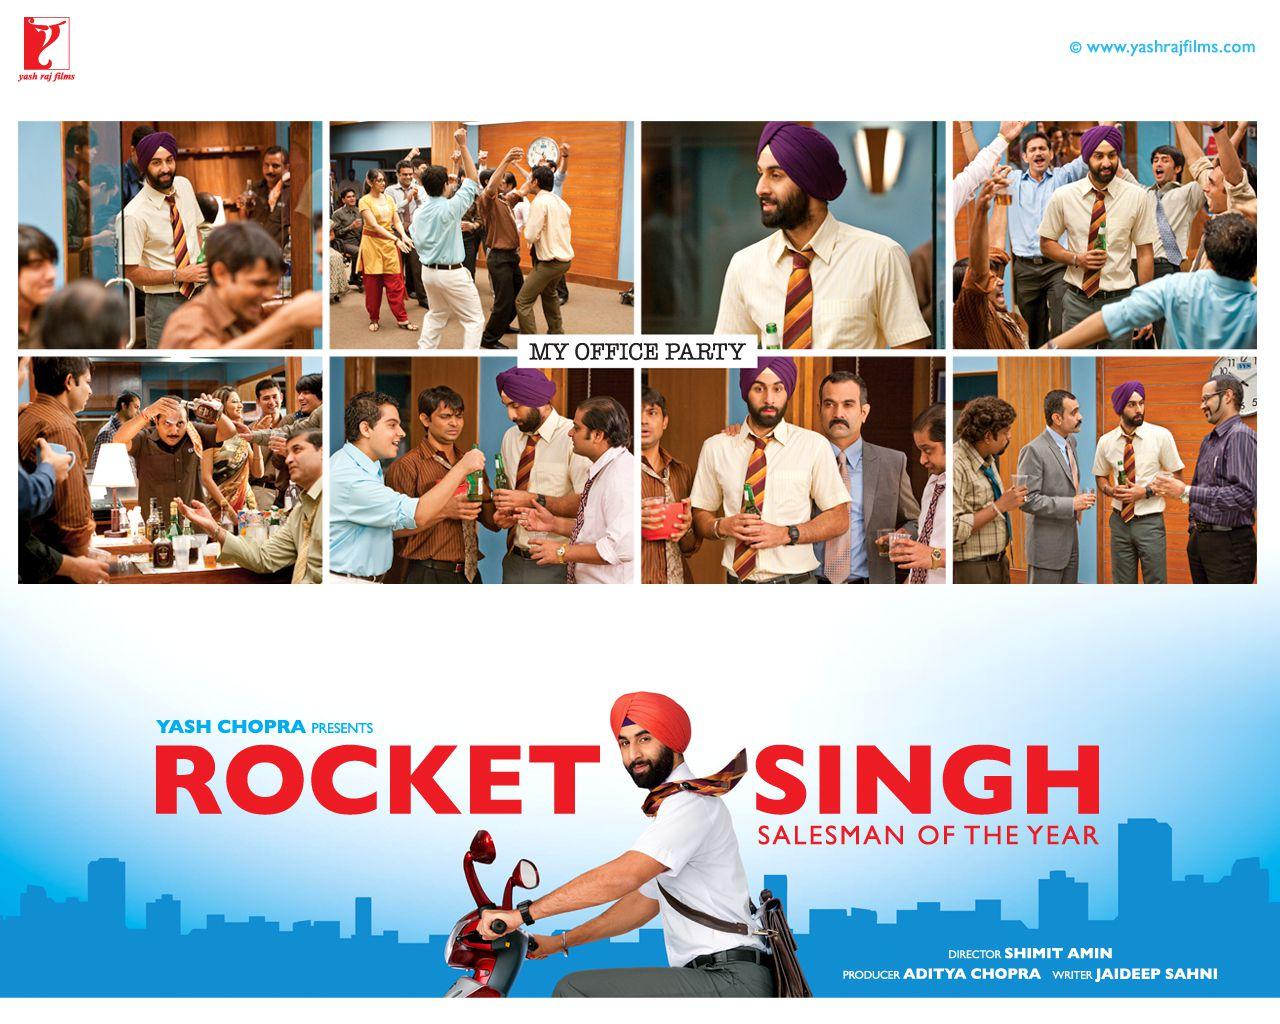 kinopoisk.ru-Rocket-Singh_3A-Salesman-of-the-Year-1177802--w--1280.jpg